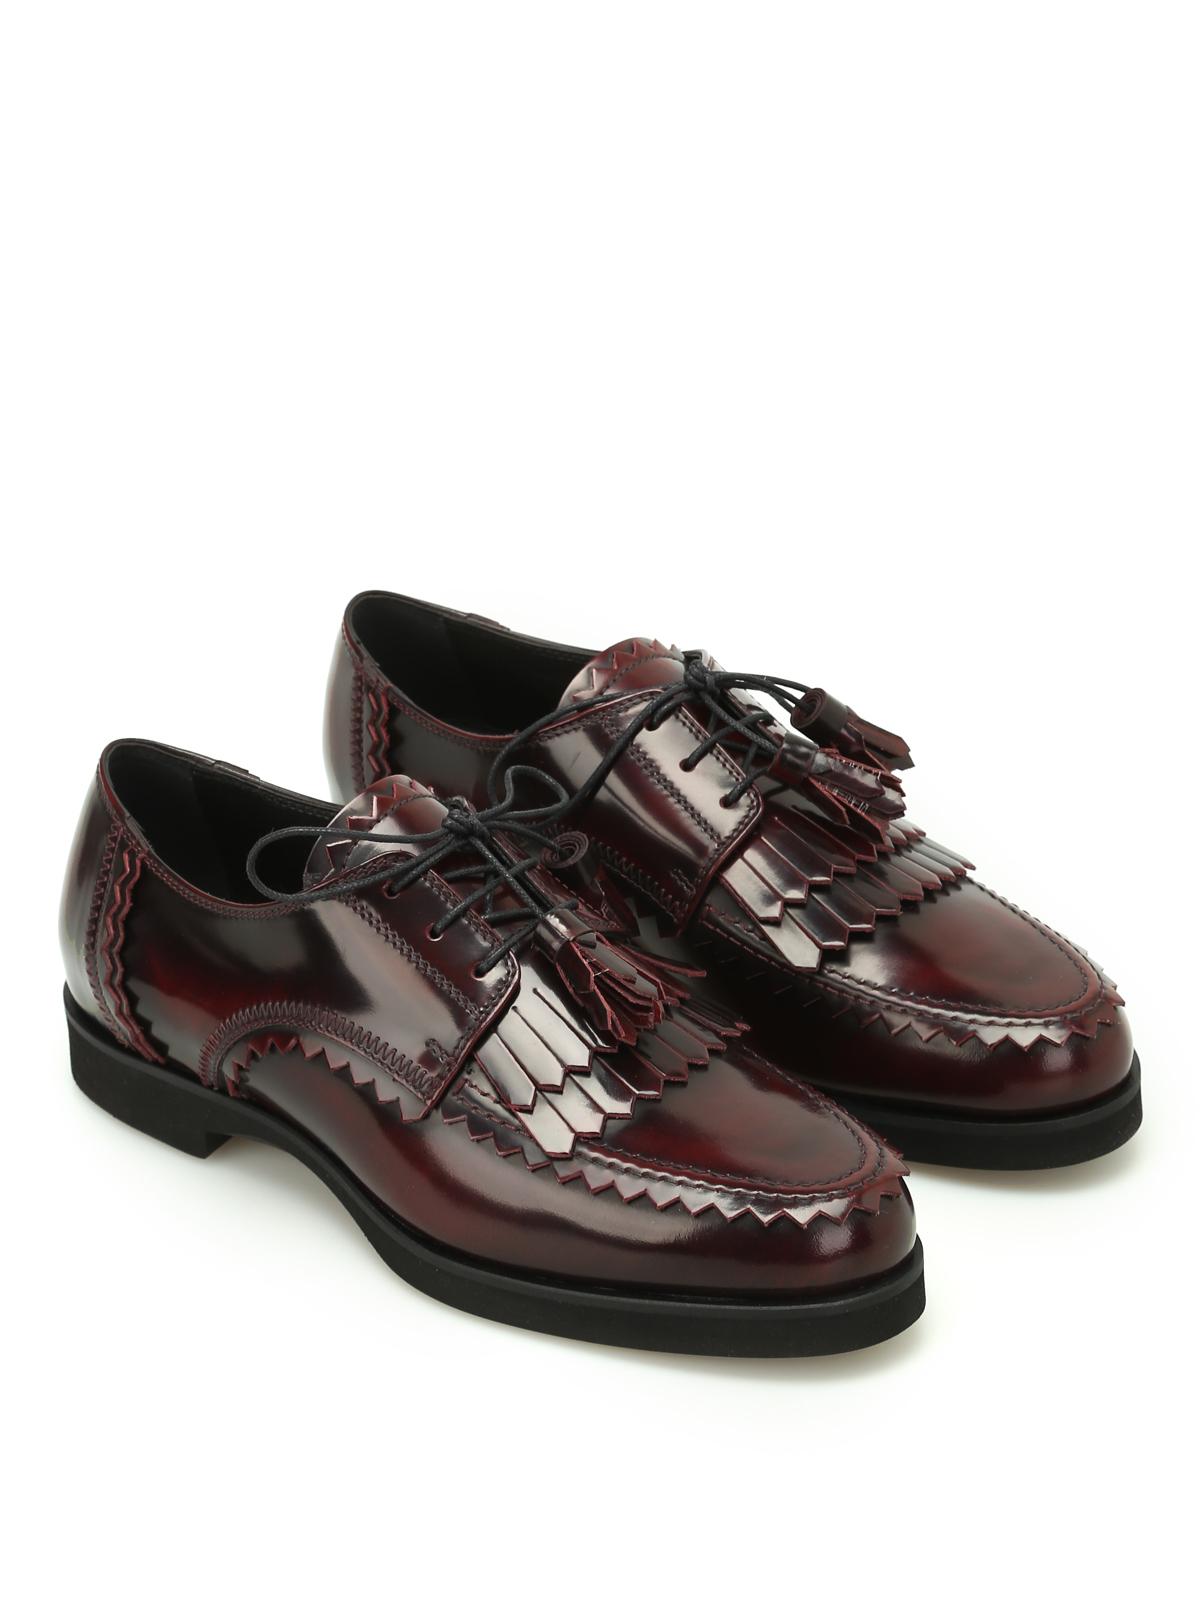 buy online 21851 c030a Tod'S - Derby con frange e nappine - scarpe stringate ...